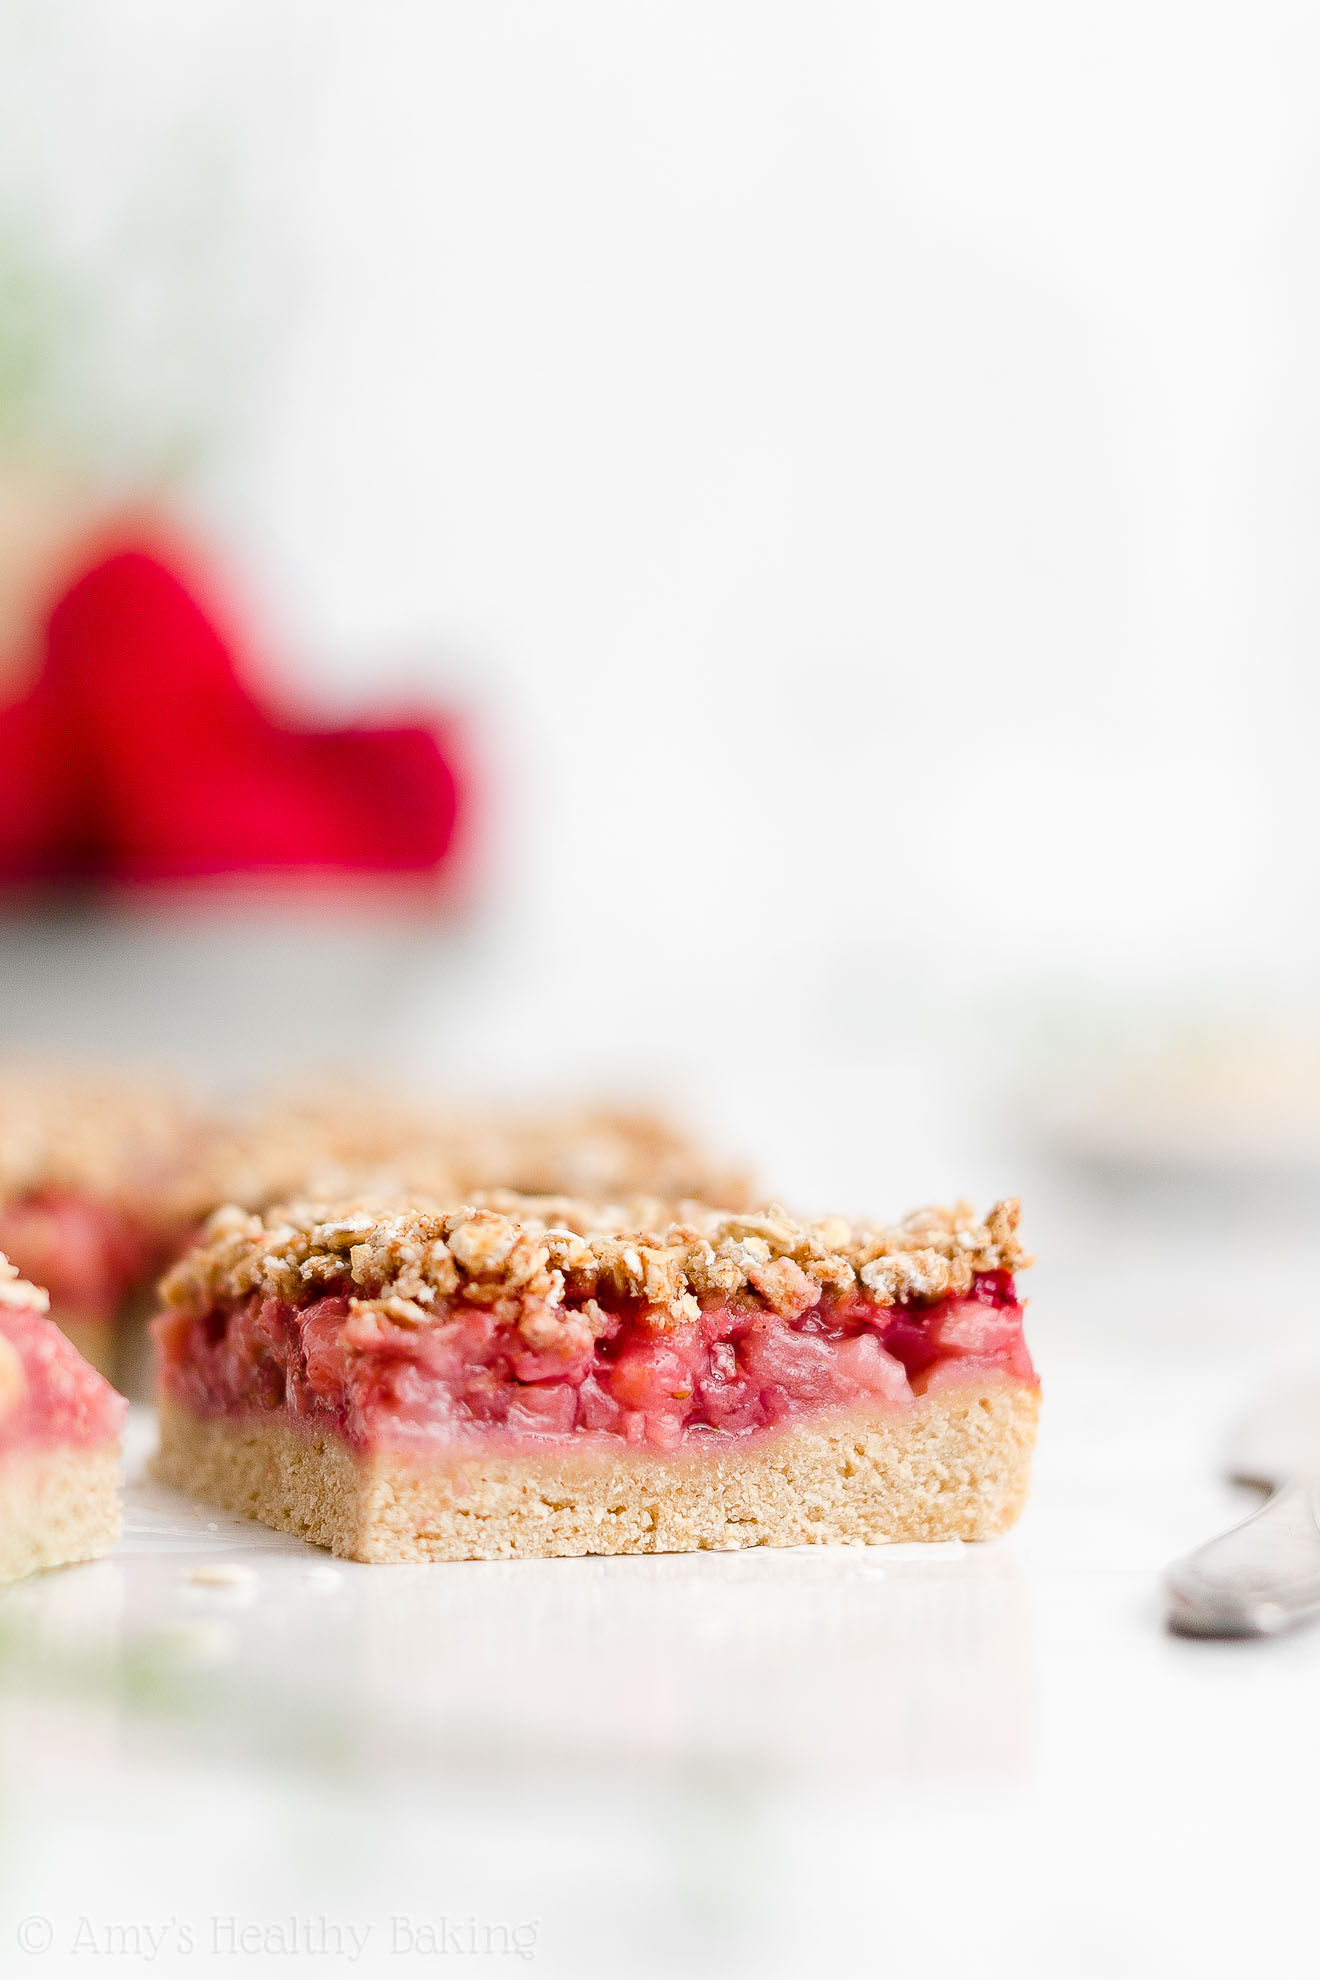 Best Easy Healthy Gluten Free Dairy Free Vegan Strawberry Oat Crumble Bars